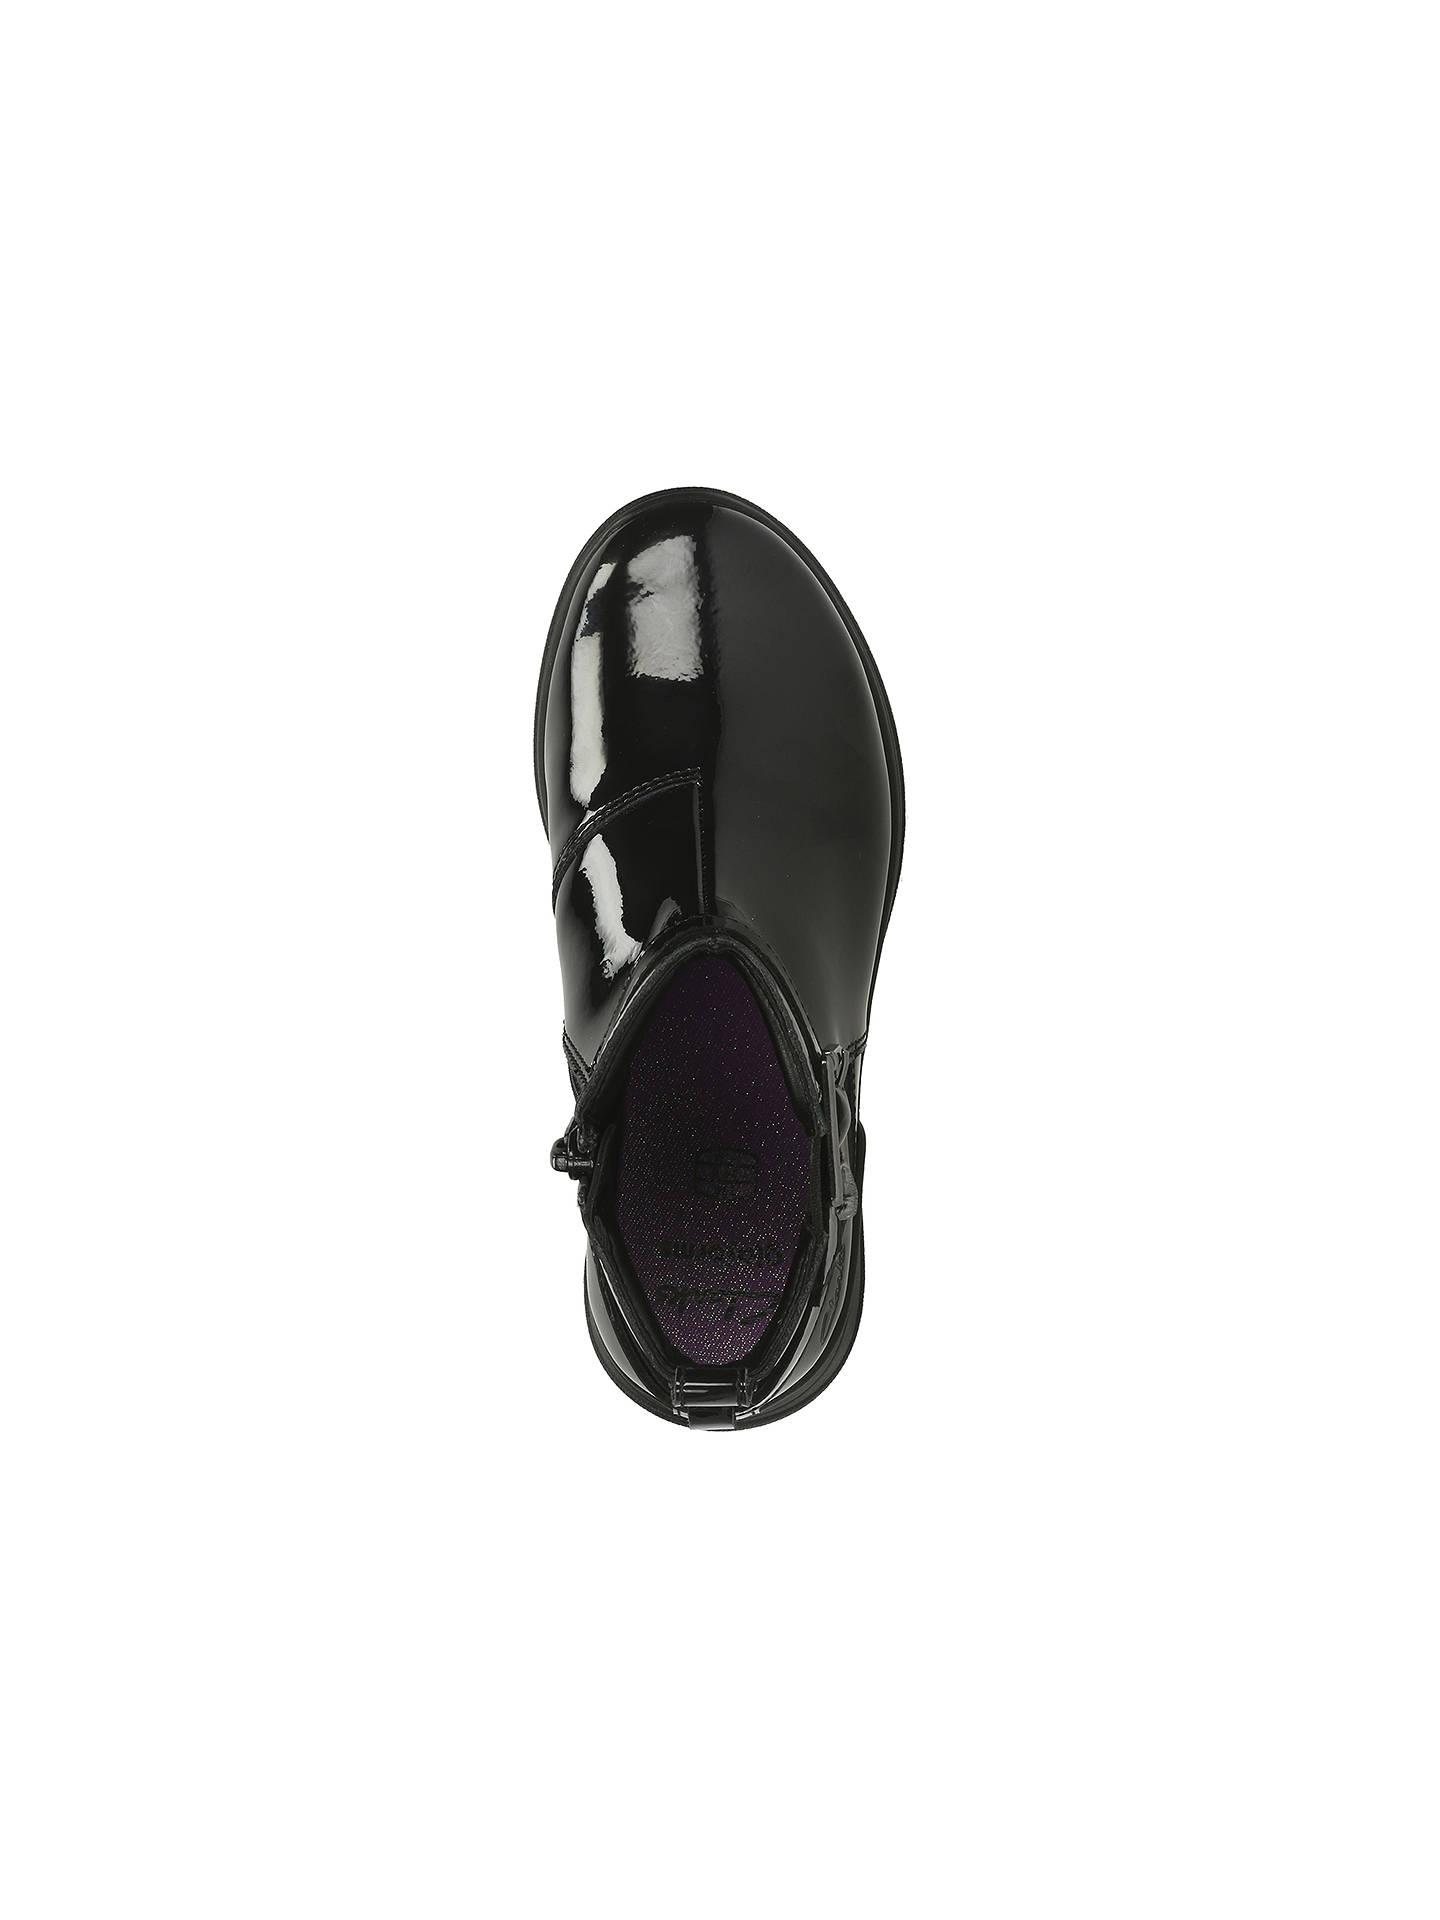 Girls Black Patent Ankle Boots Zip Fastening Mariel Sky Jnr